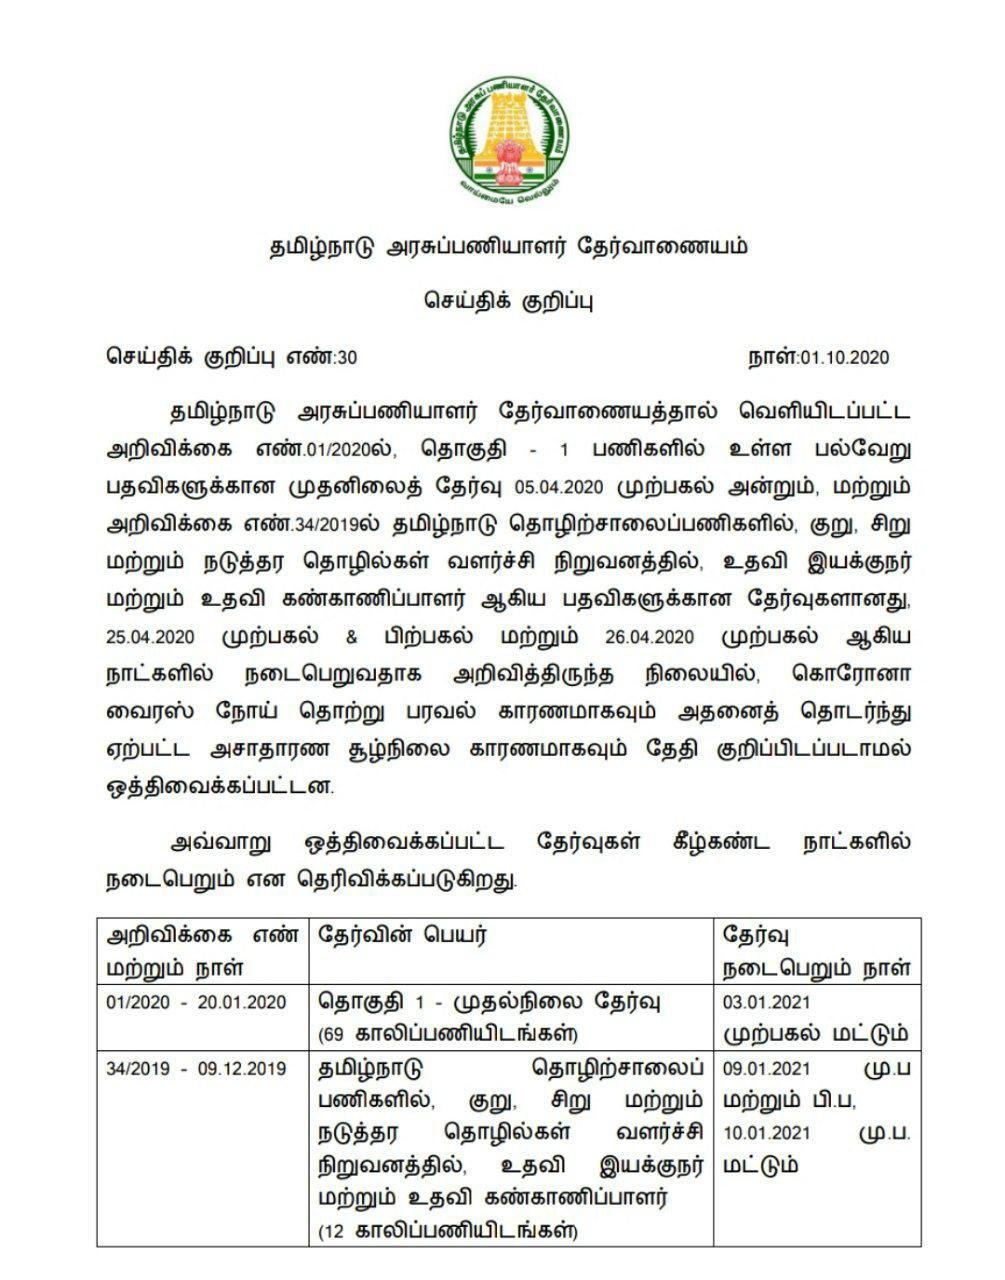 TNPSC GROUP I Prelims 2020 Exam Dates Announced